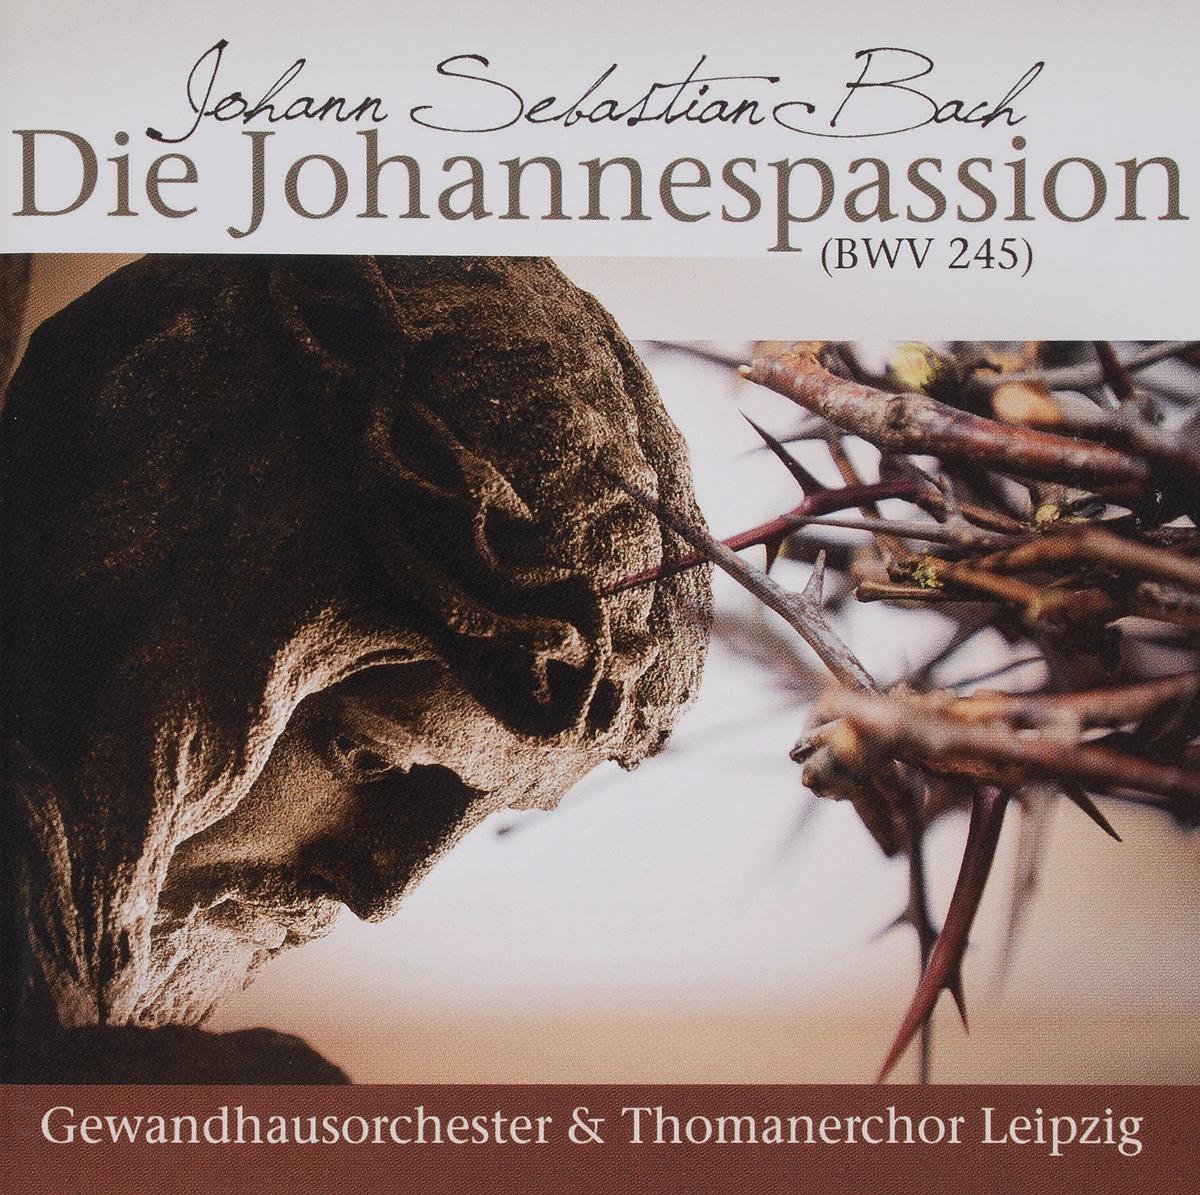 J.S. Bach. Die Johannes Passion (2 CD) николаус арнонкур курт экуилуз макс ван эгмонд жак виллисеч conсentus musicus wien das alte werk bach johannes passion bwv 245 2 cd